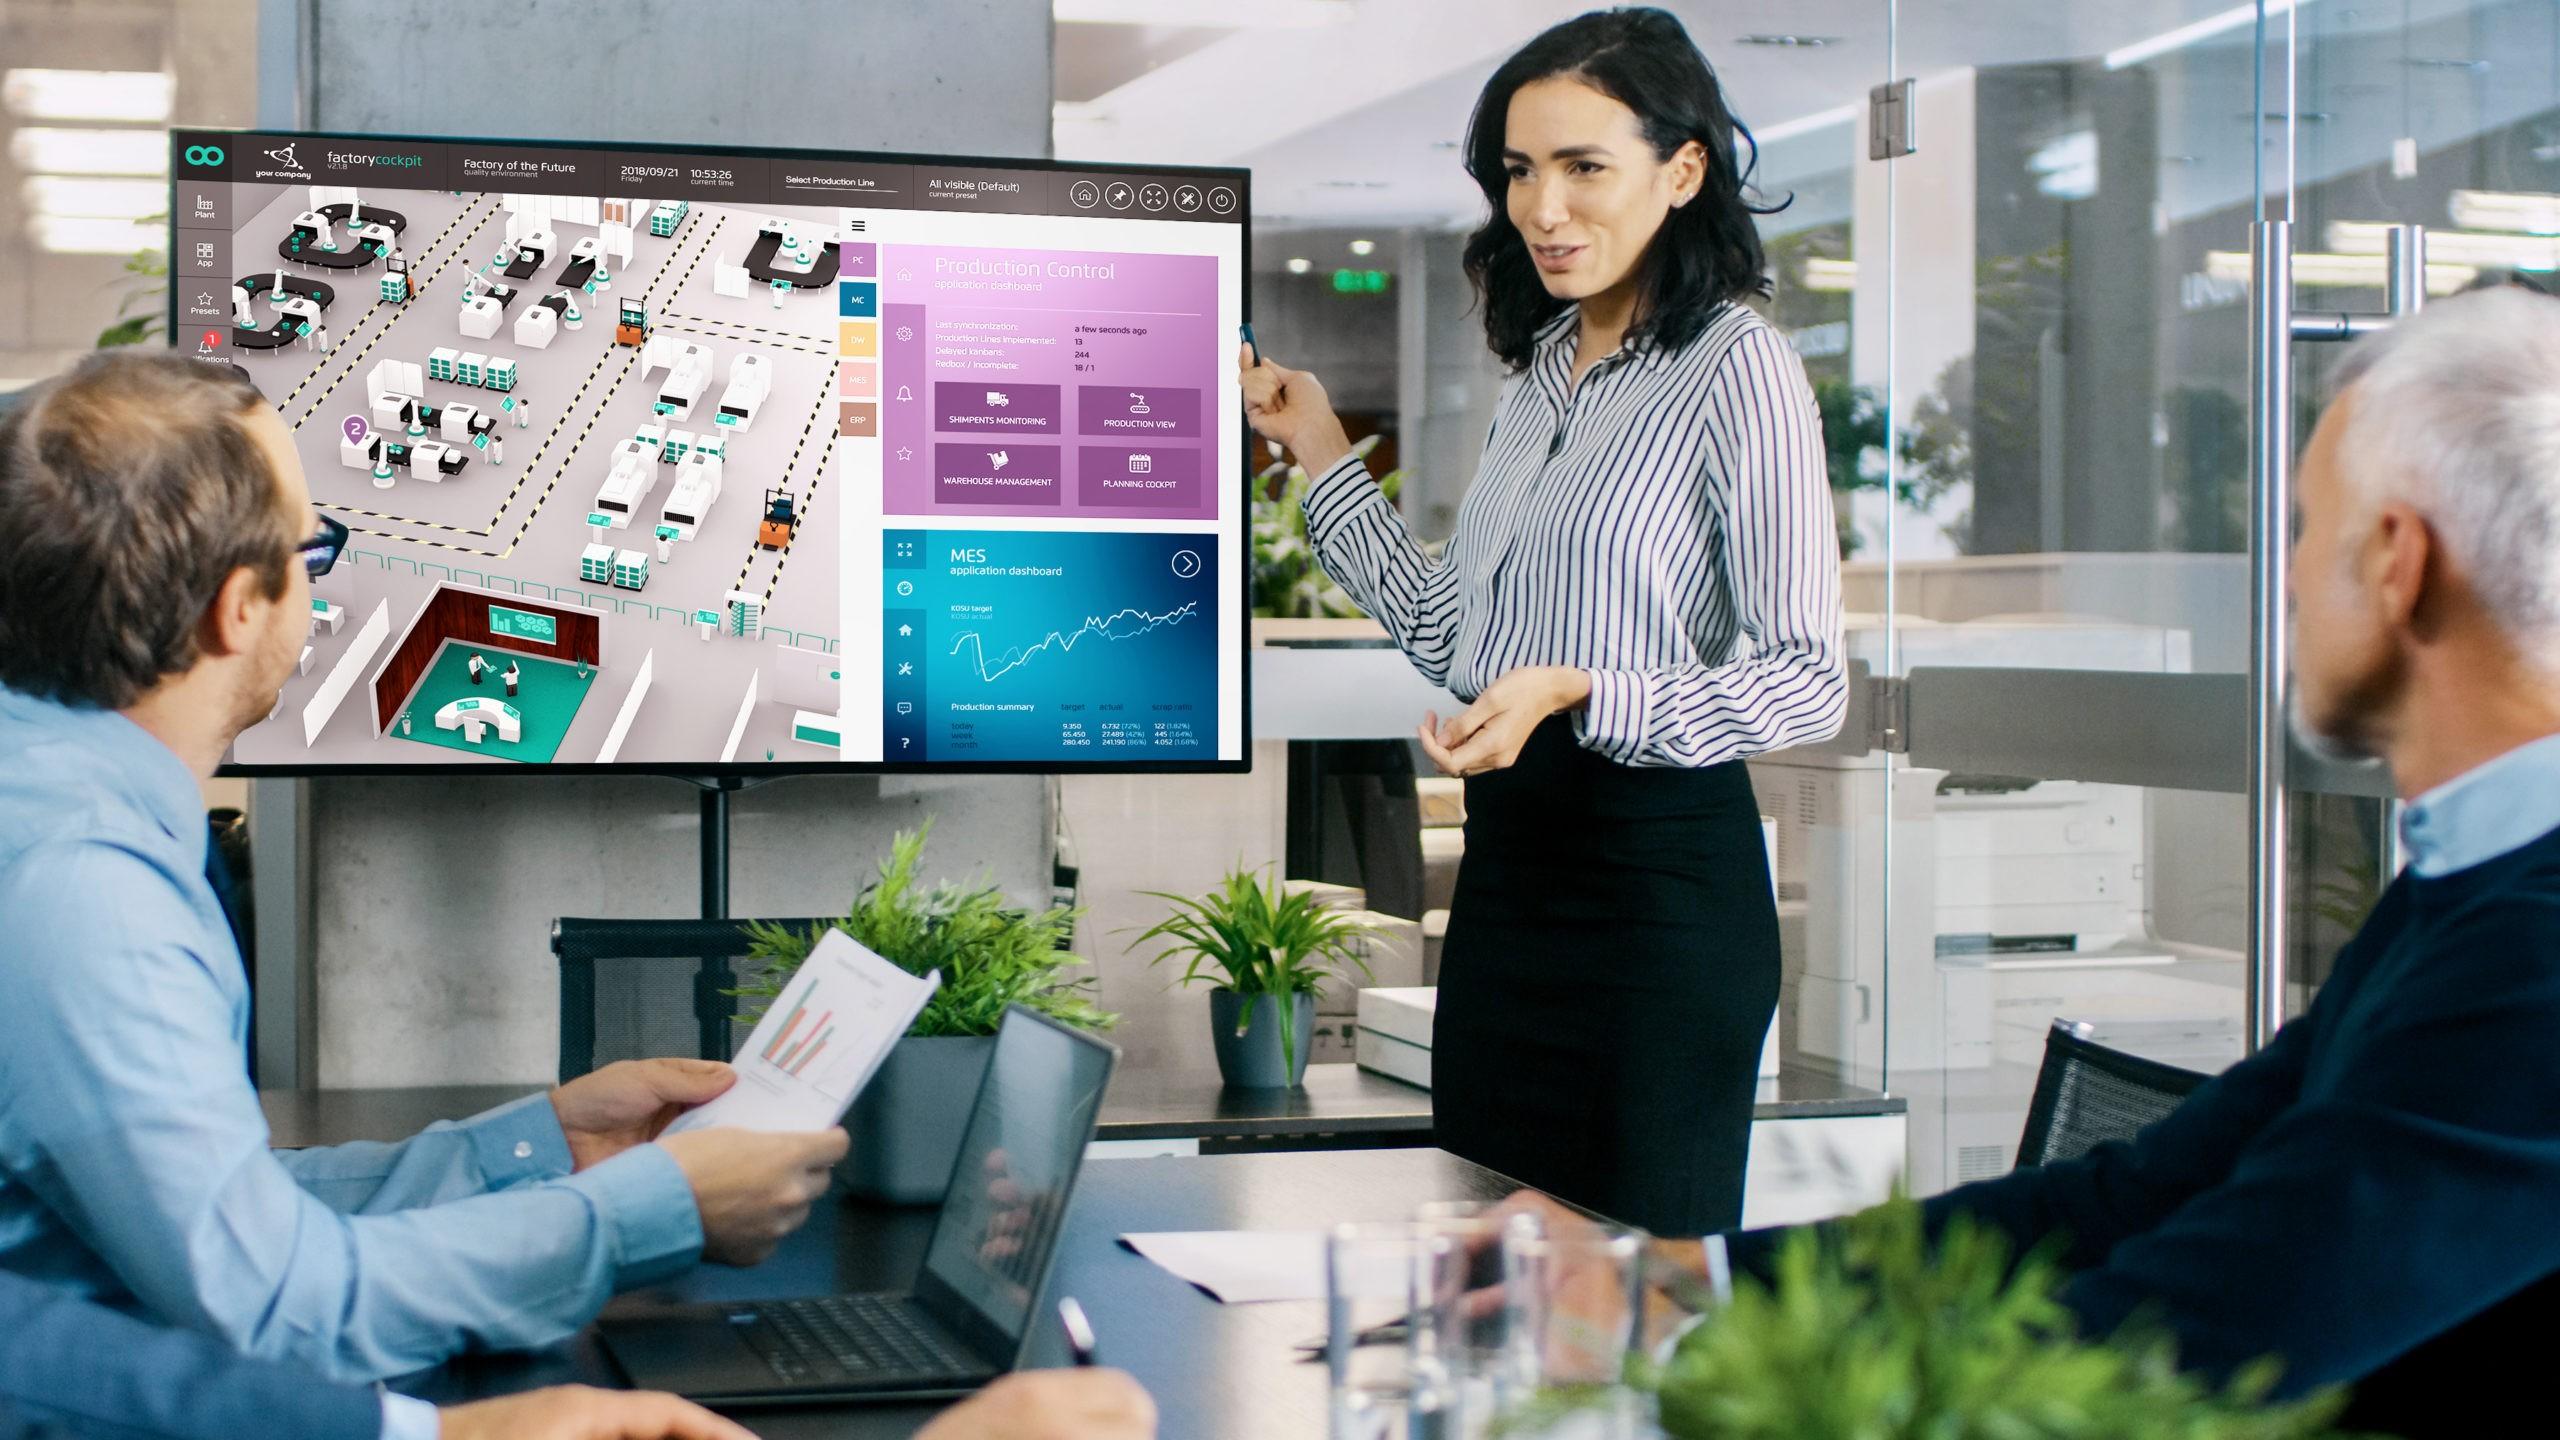 Digital Twin | Factory management software